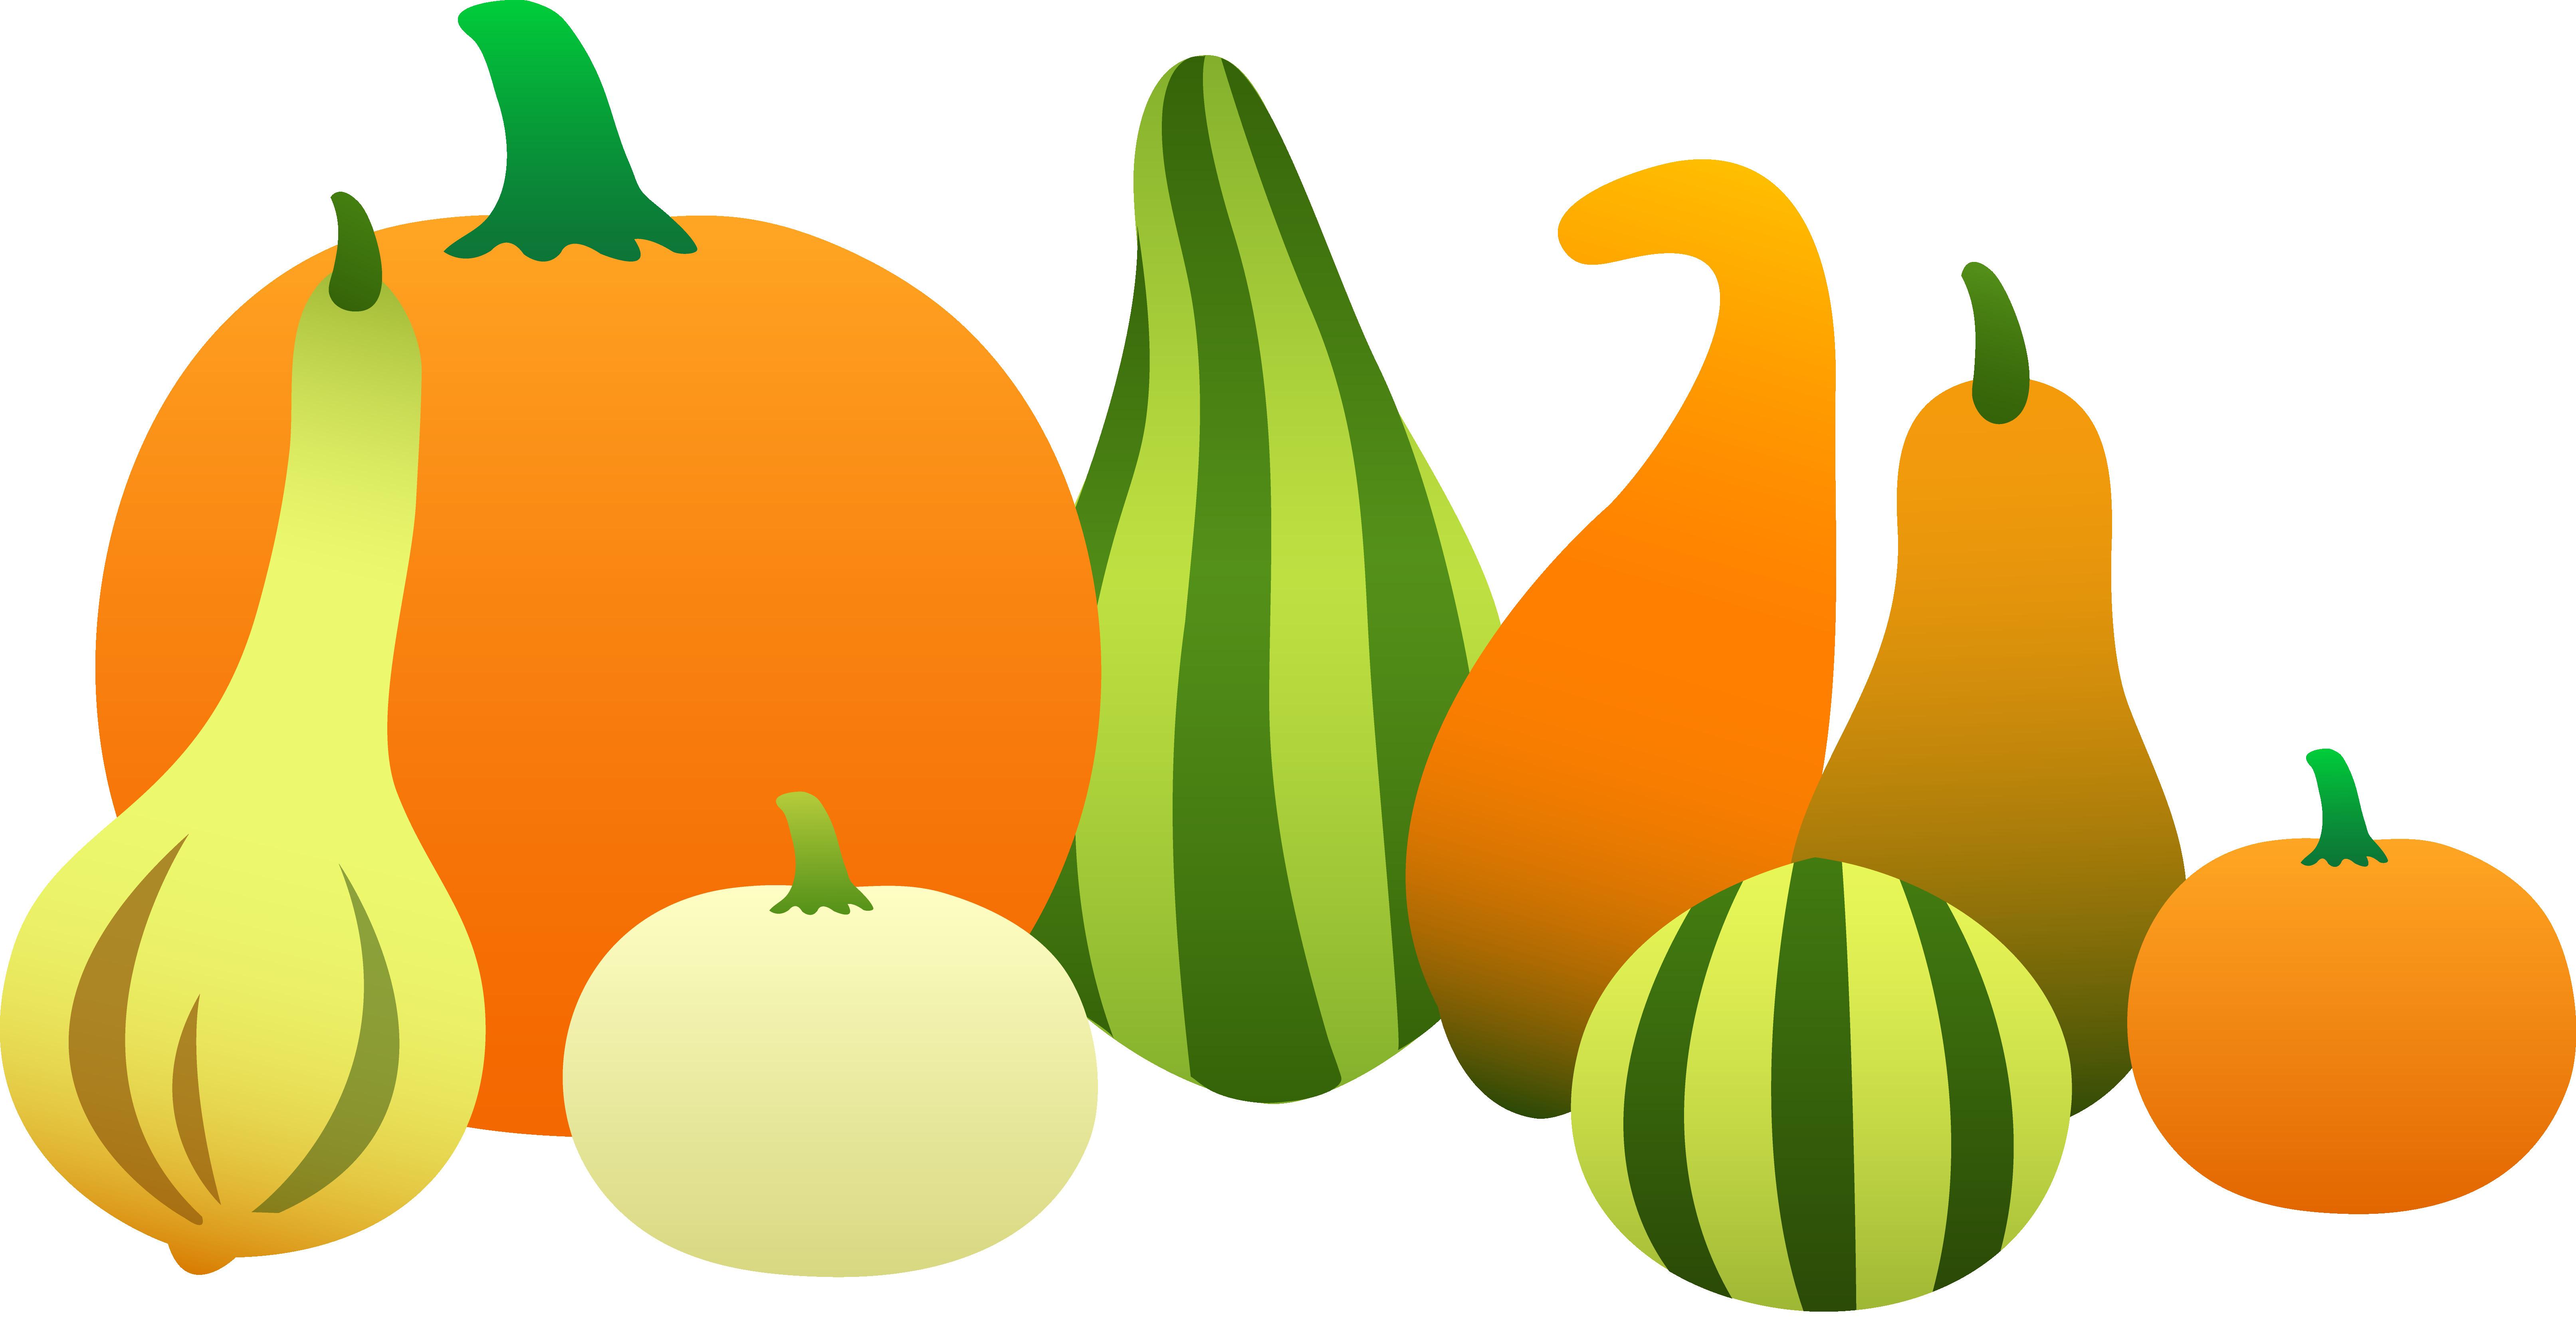 6452x3326 Pumpkins Clipart Free Thatswhatsup